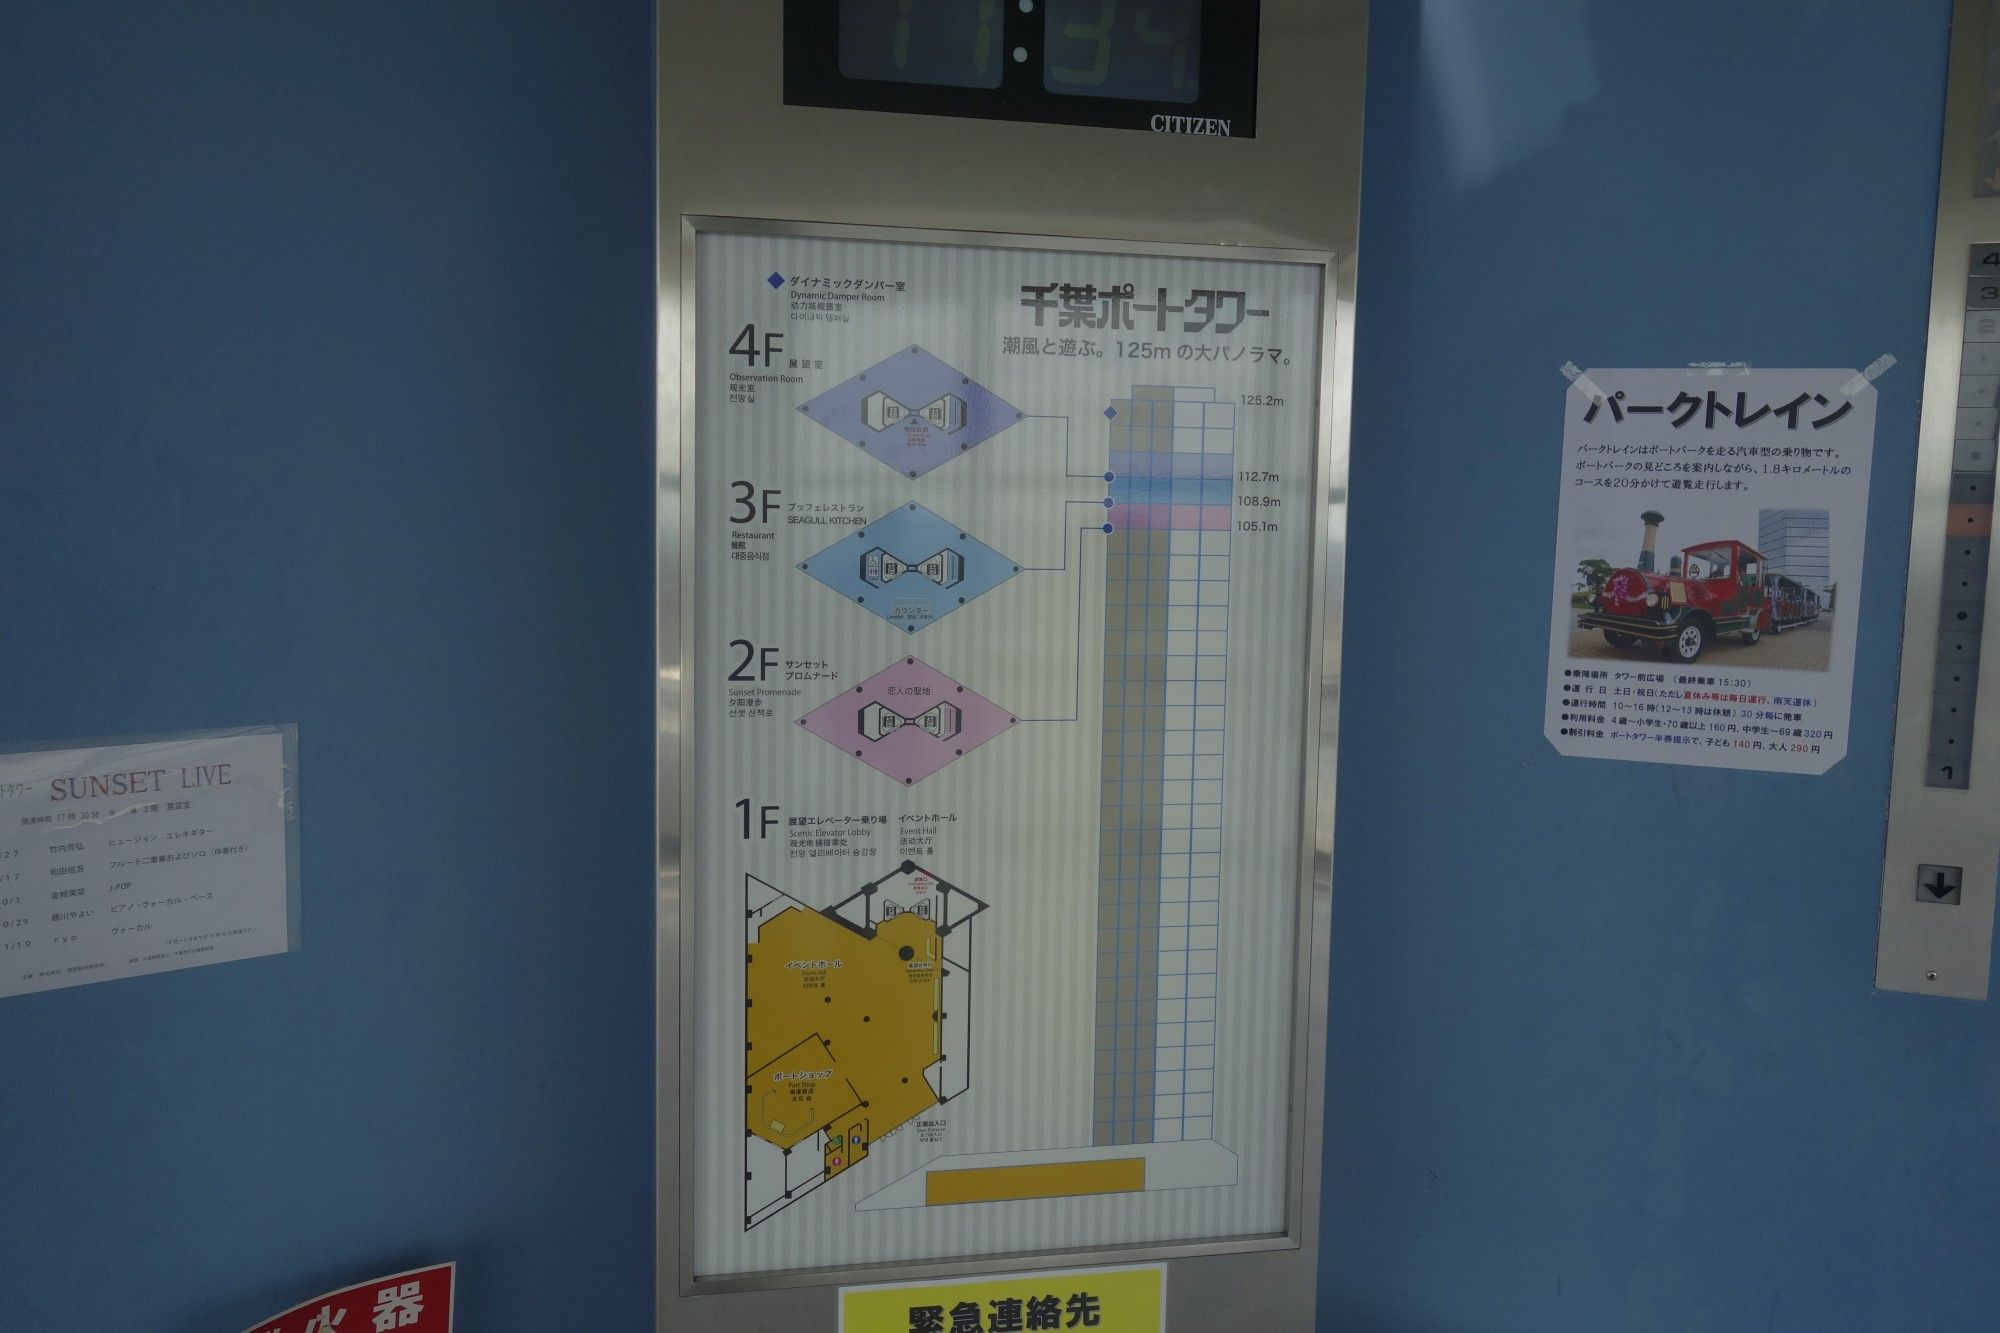 http://livedoor.blogimg.jp/taiteiore-meisuiyugi/imgs/f/d/fd92eb97.jpg